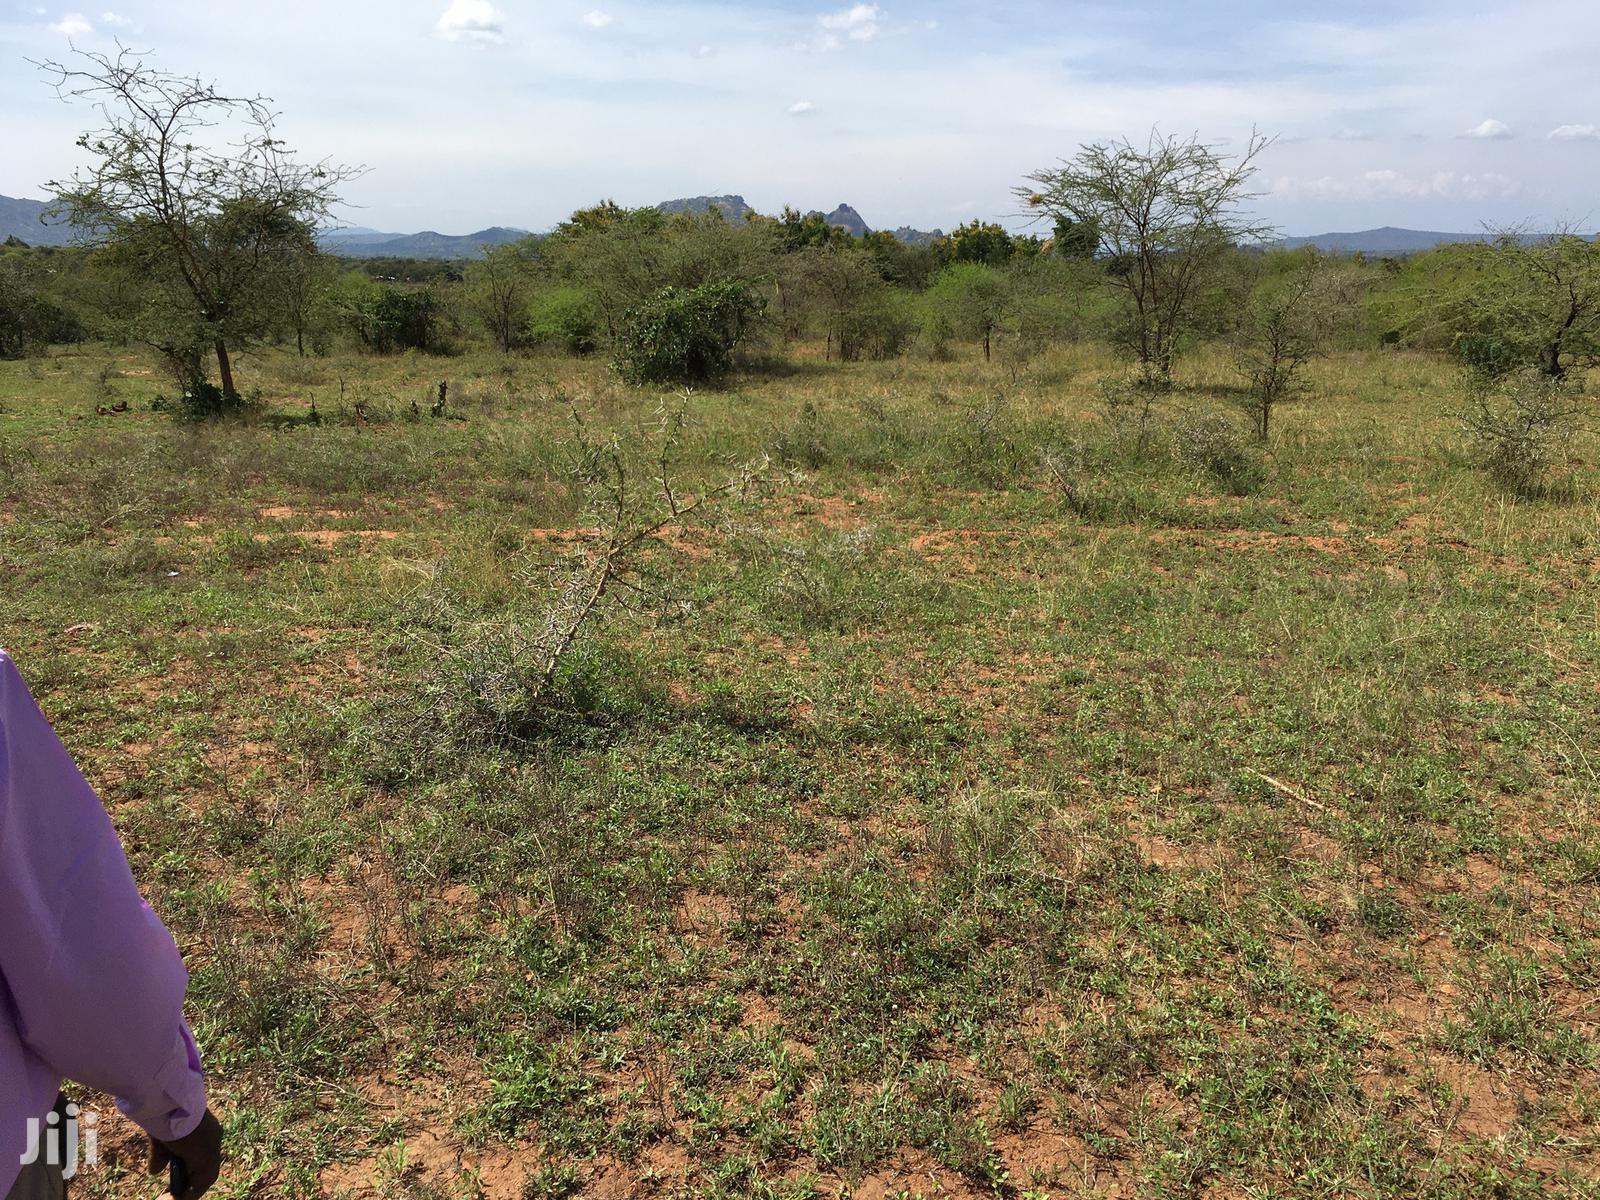 Two Acres for Sale in Kithimani-Sophia Matuu | Land & Plots For Sale for sale in Kithimani, Machakos, Kenya